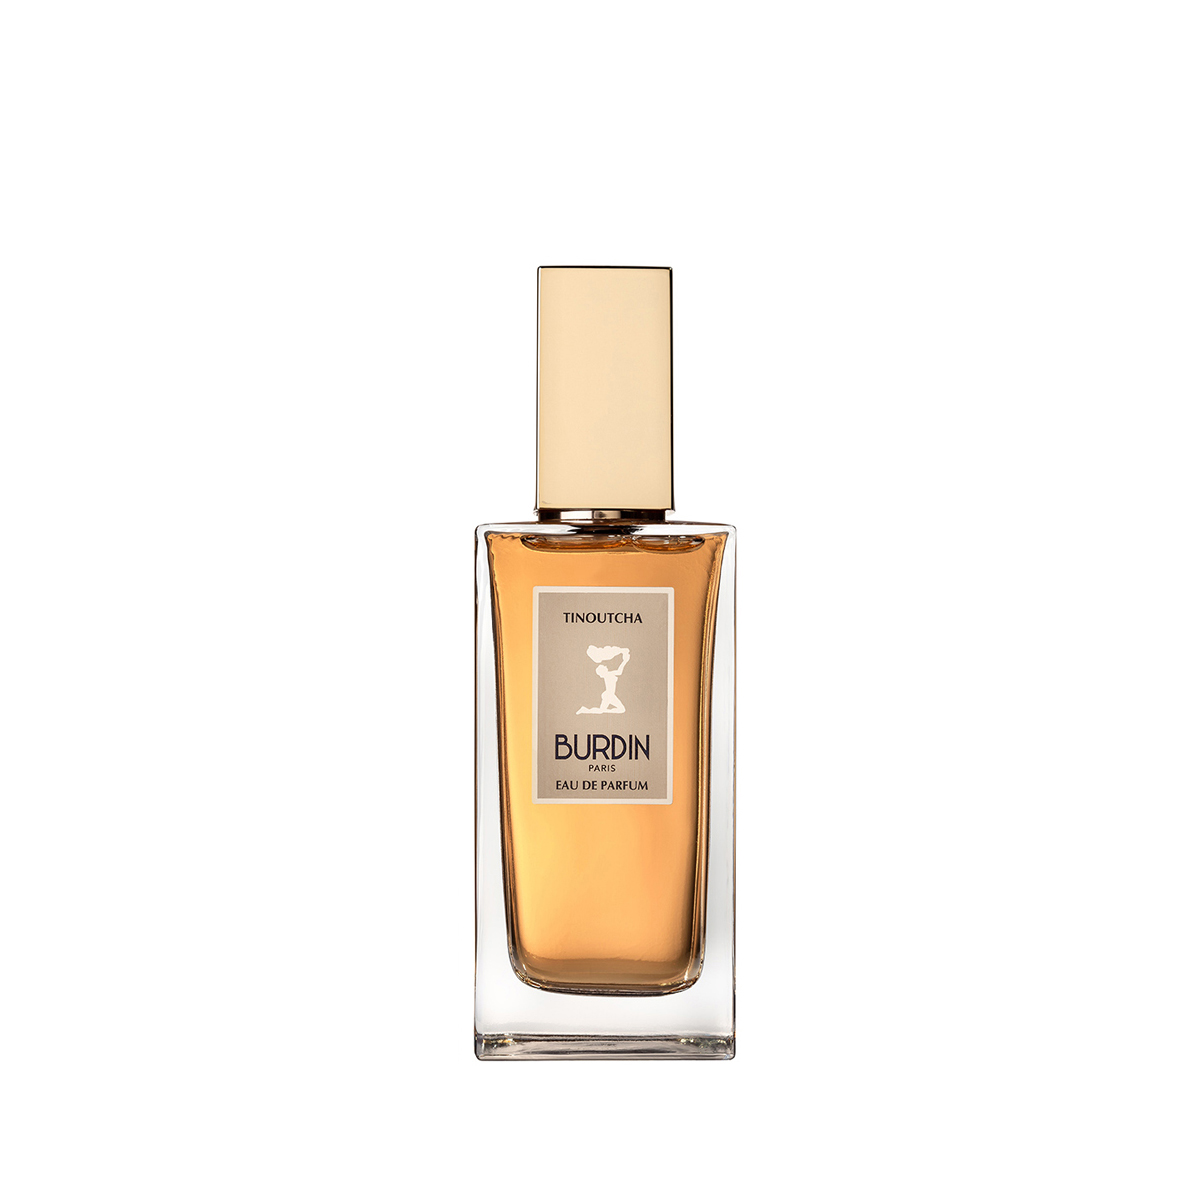 Burdin Tinoutcha Eau De Parfum 100 ml (woman) 18553